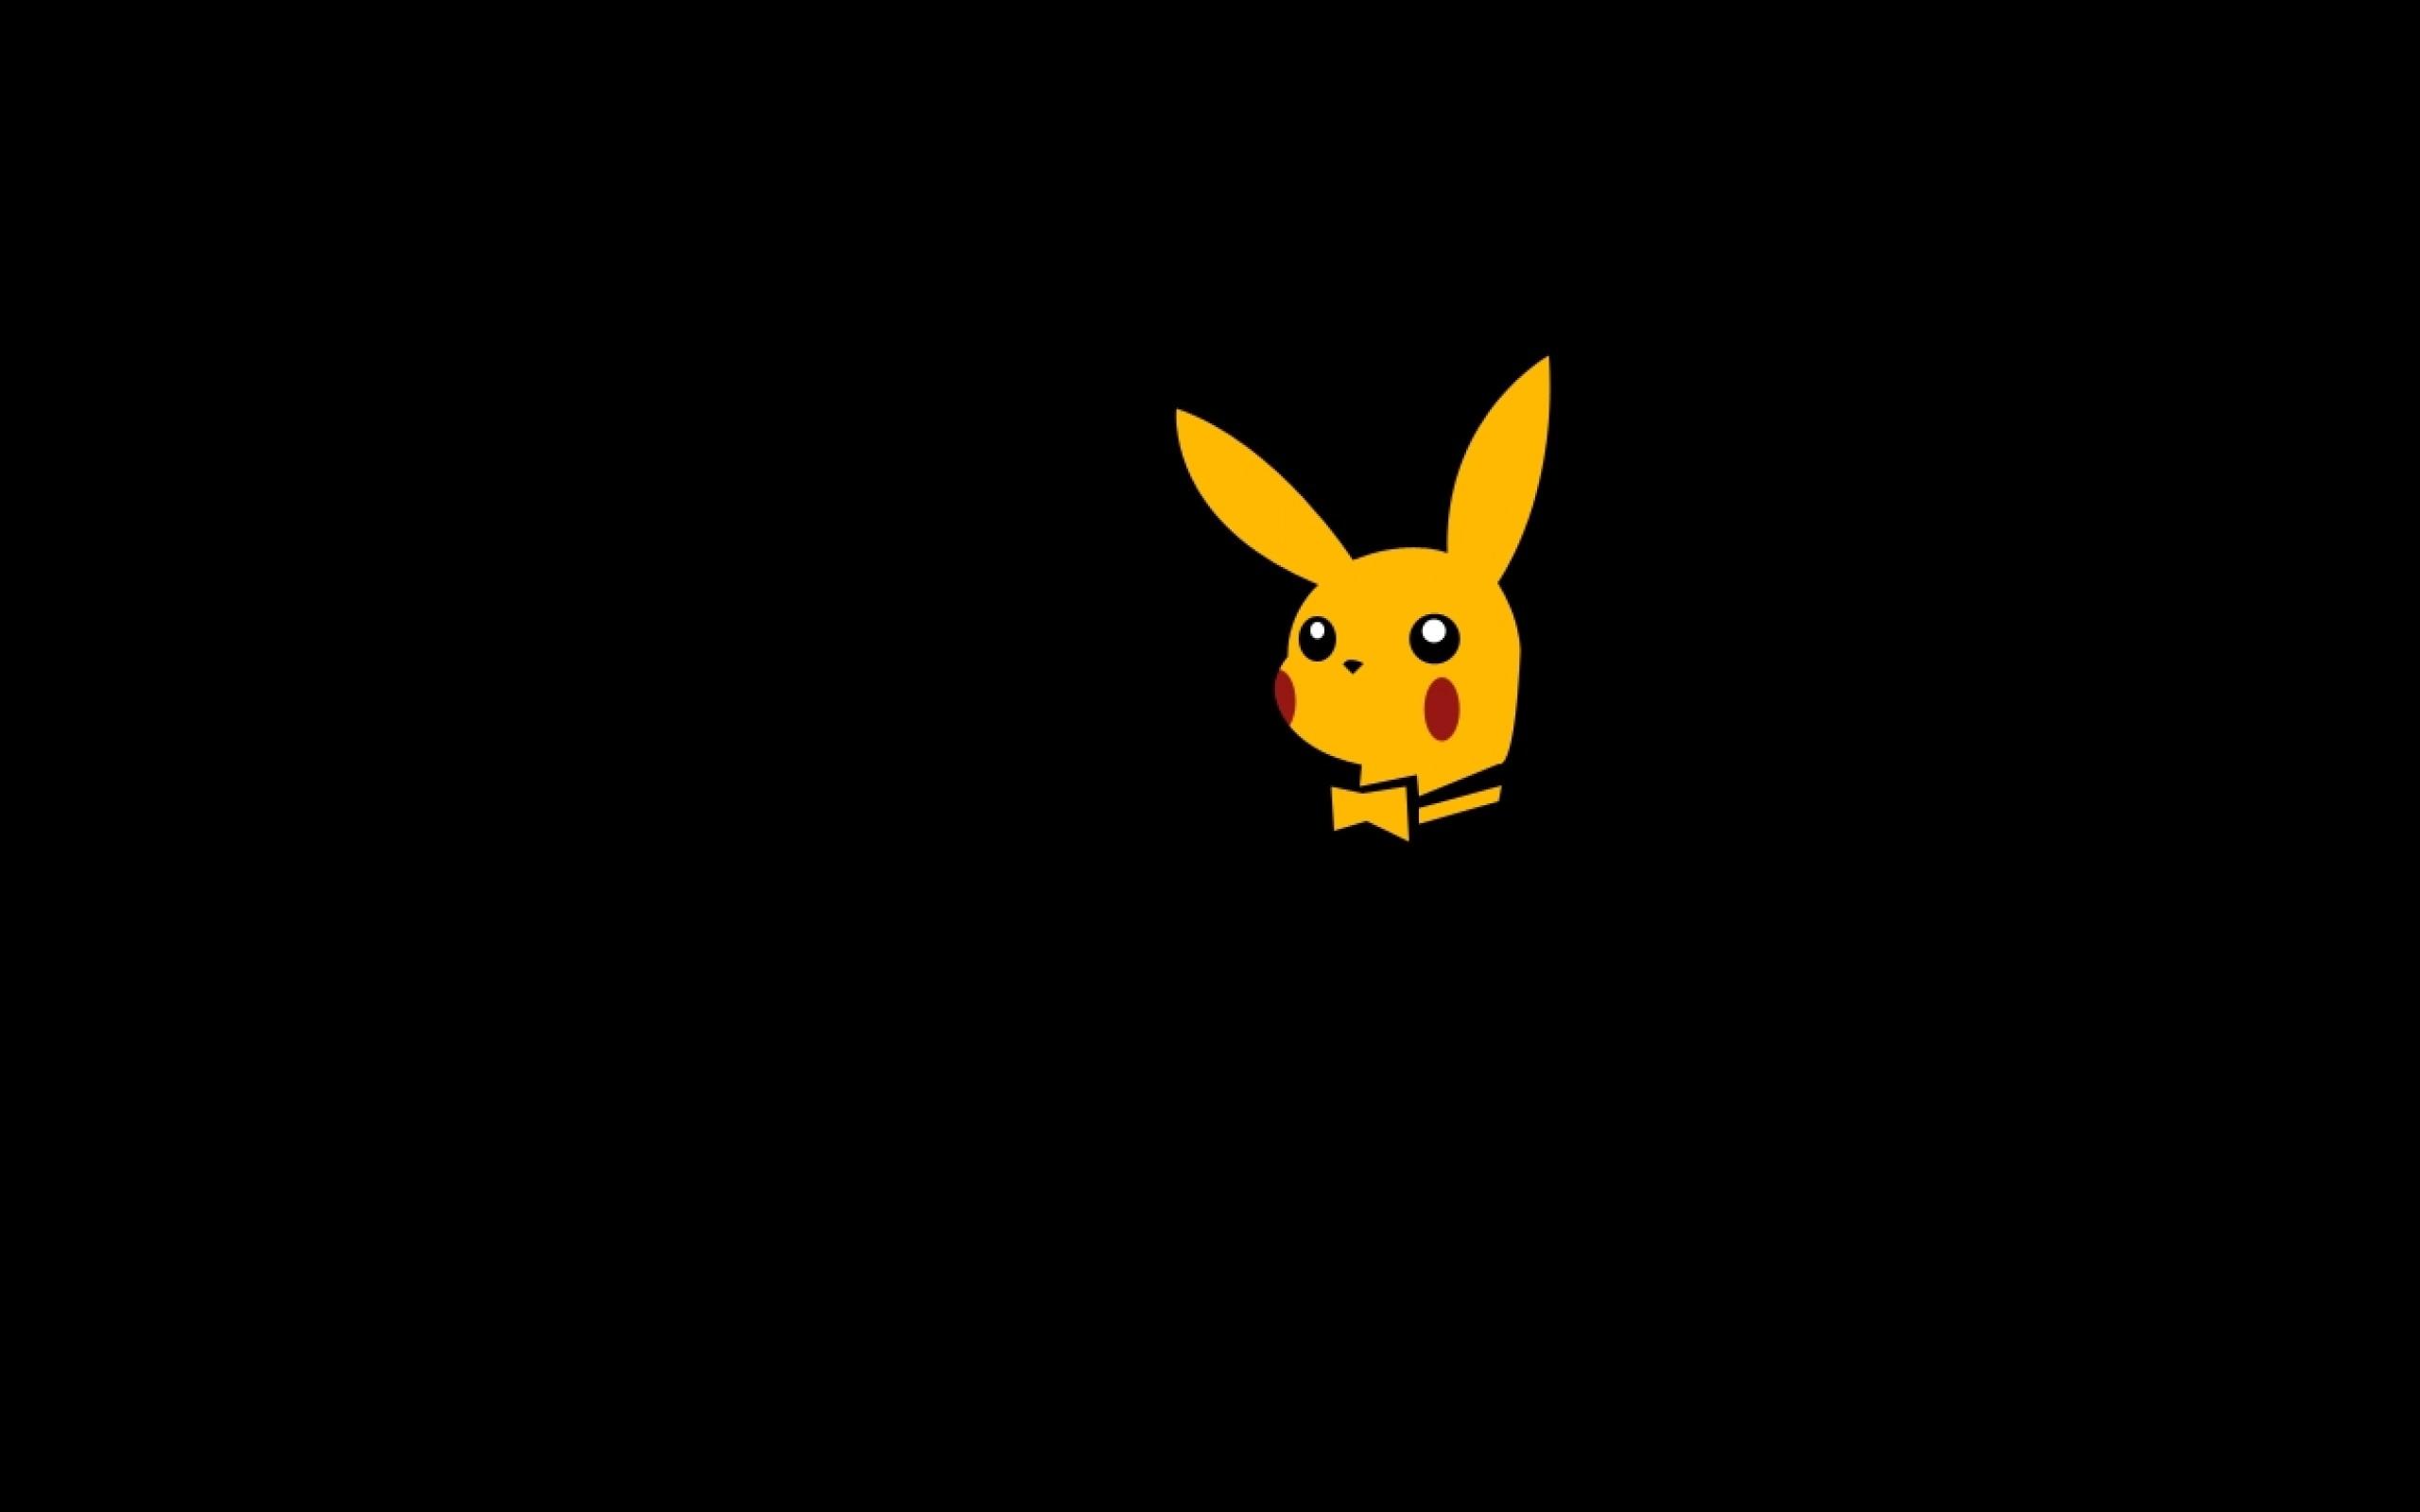 pikachu playboy magazine bunny ears 1366×768 wallpaper Wallpaper HD